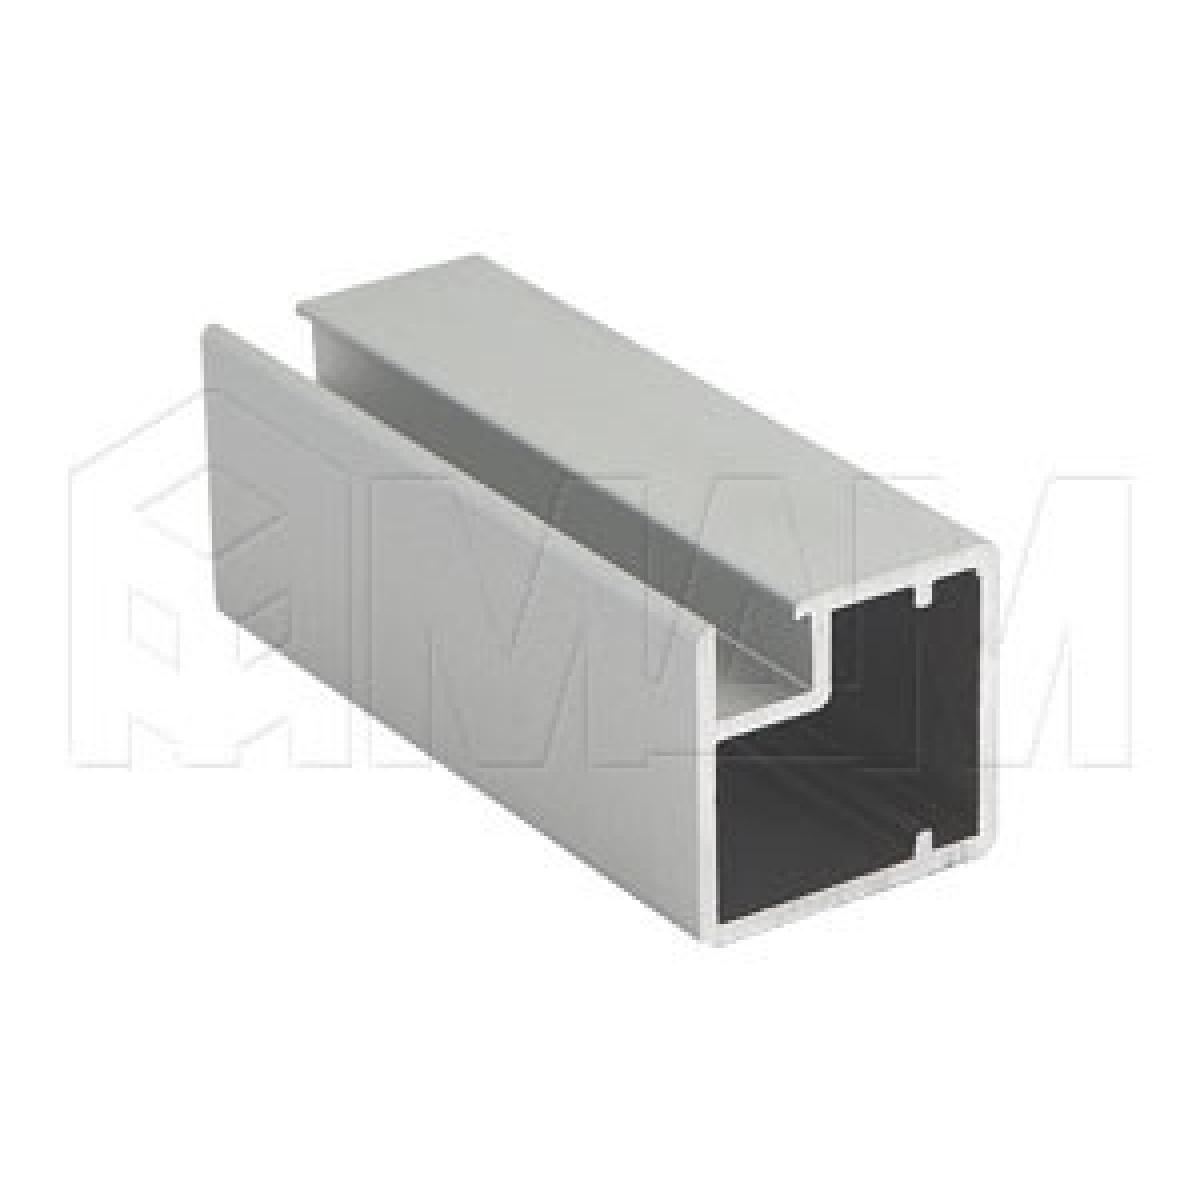 INTEGRO Профиль рамочный узкий, 19х20х19 мм, серебро, L-6000